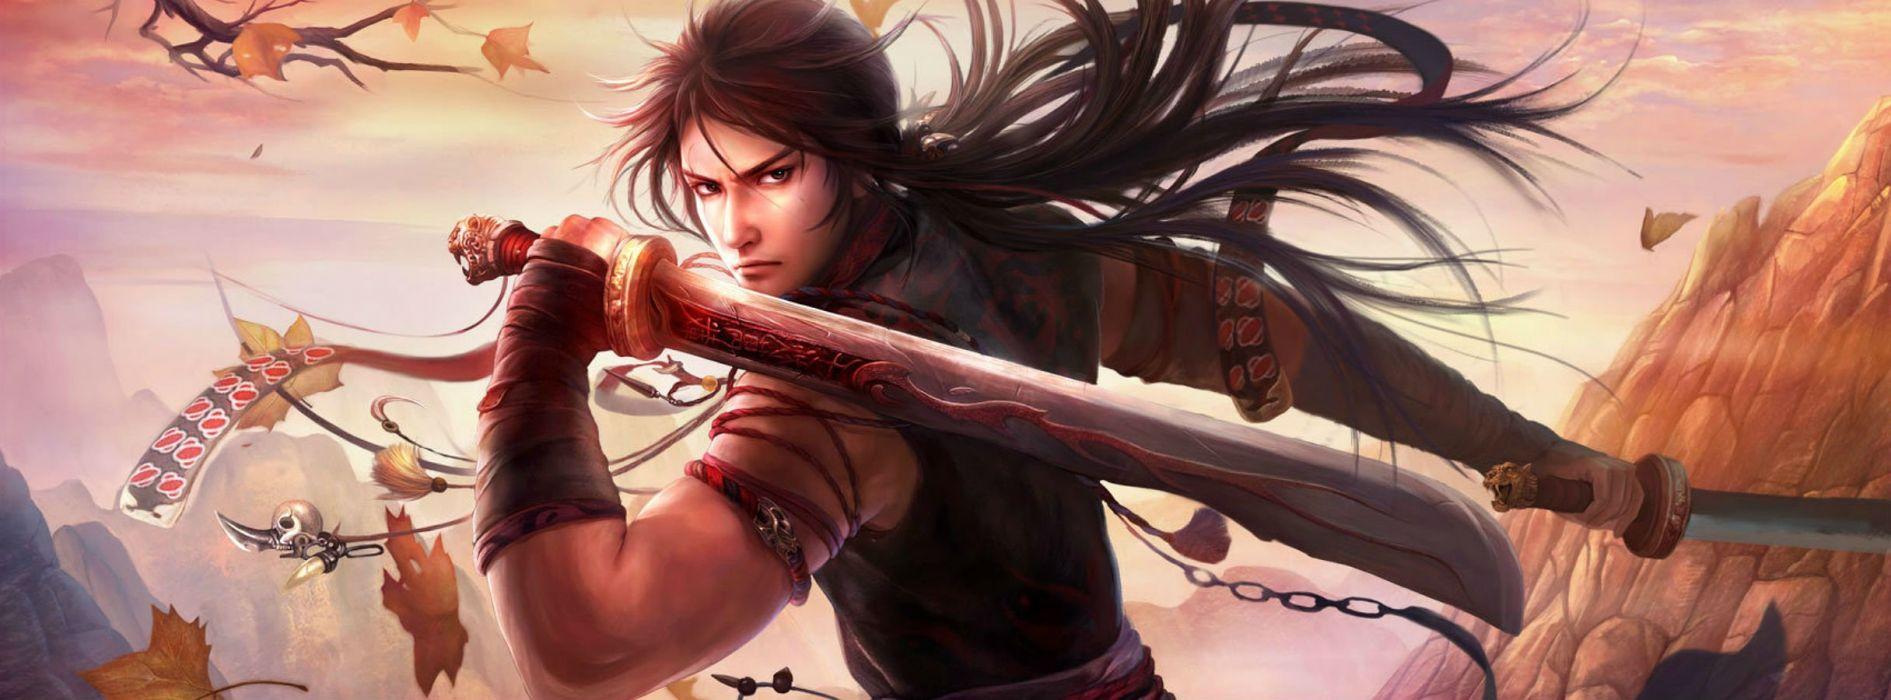 SWORDSMAN ONLINE fantasy mmo rpg action fighting martial kung 1sworo wuxia hero heroes warrior samurai asian poster wallpaper